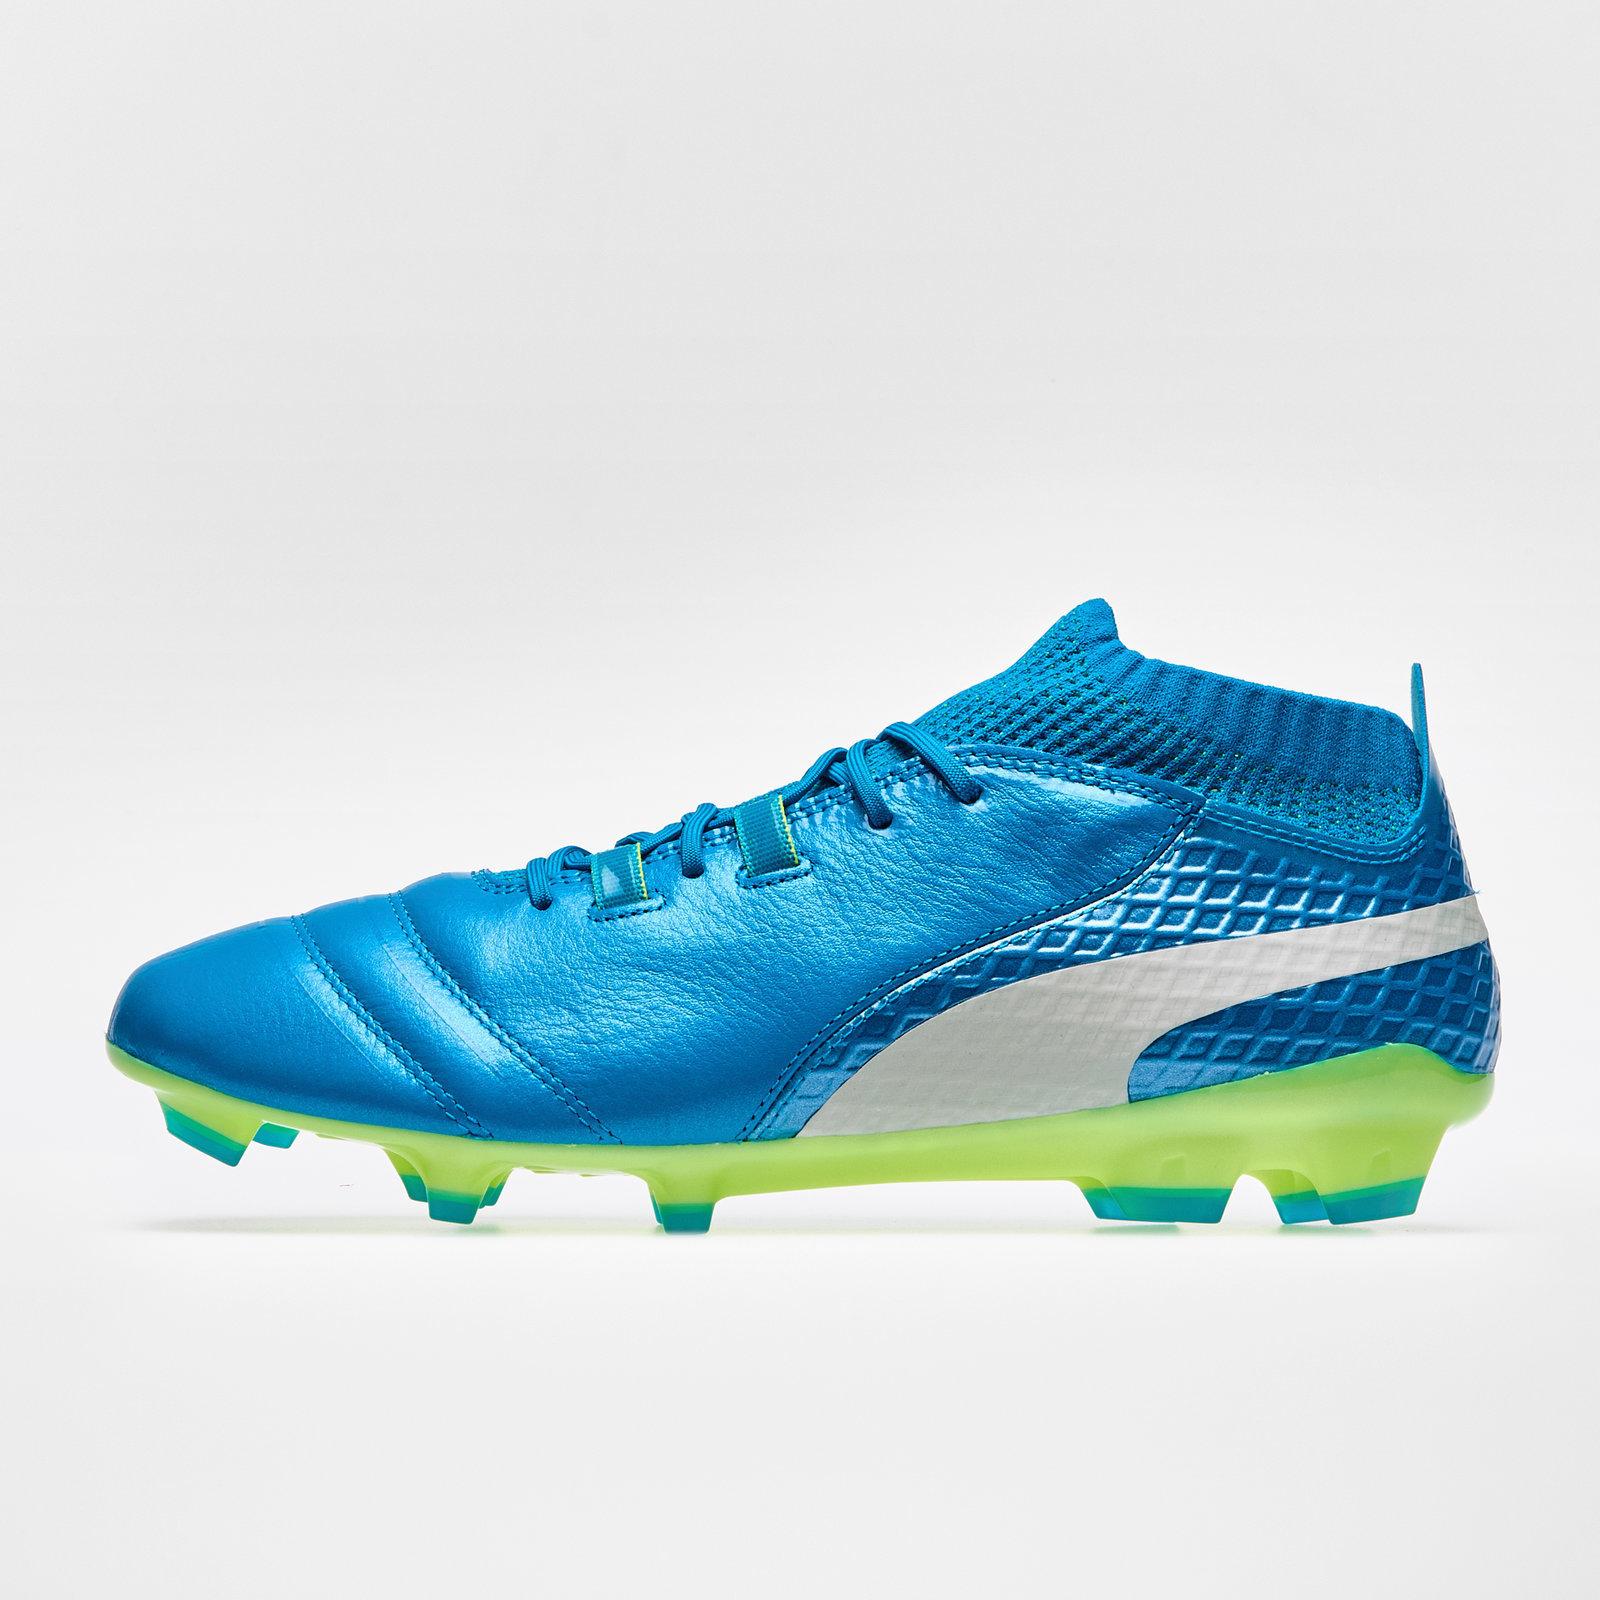 Mens Puma One 17.1 FG Football Boots Sports Studs Trainers Shoes  3e3c0ad5a